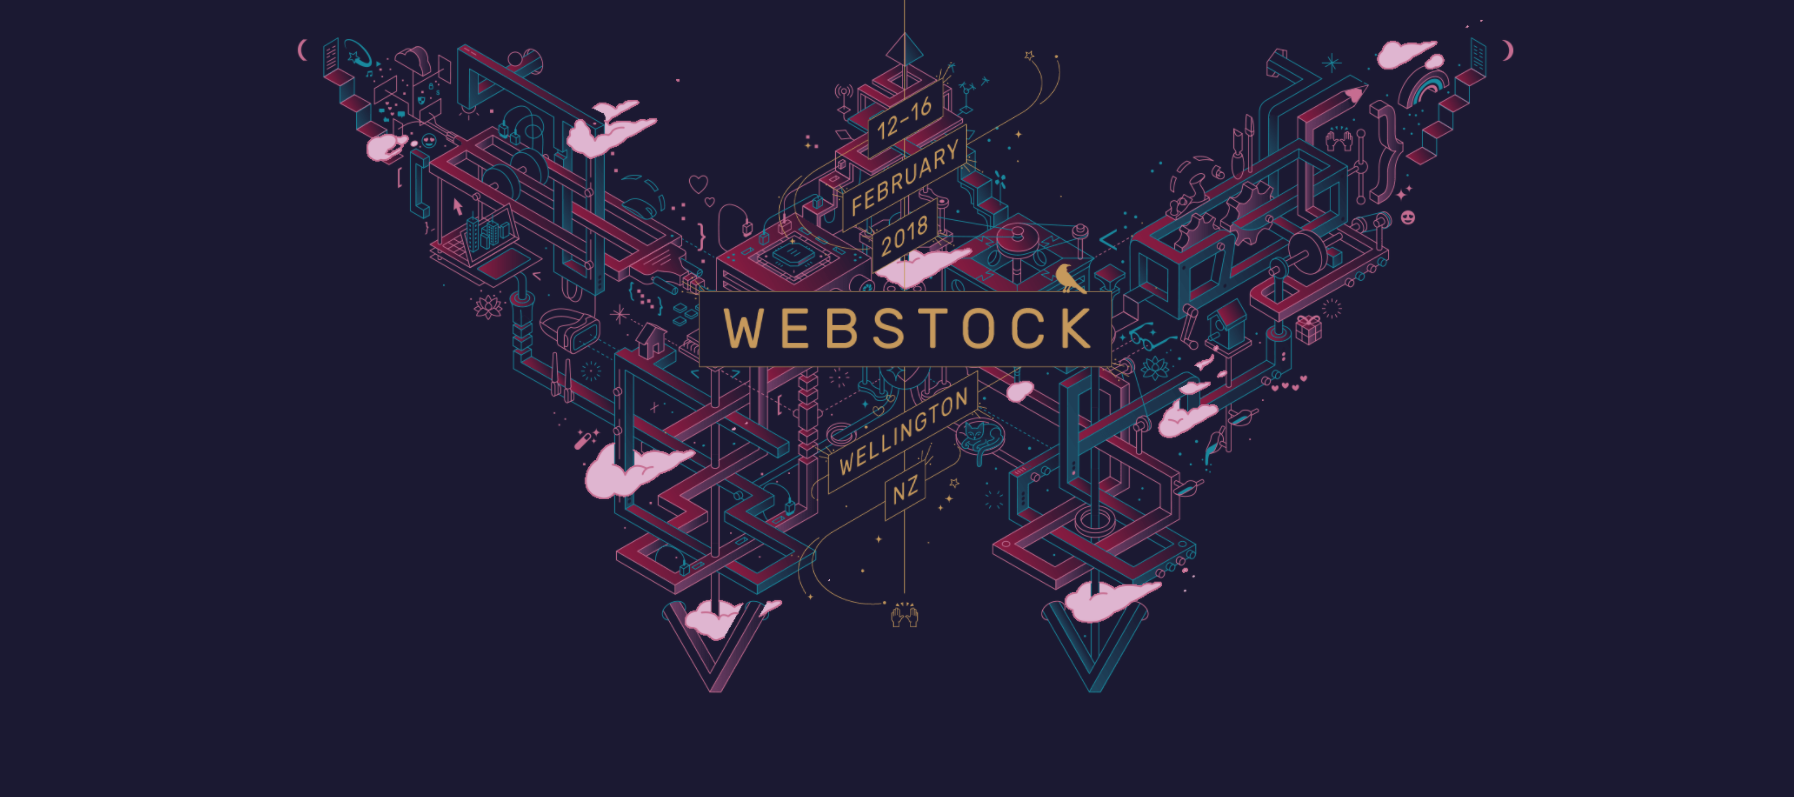 Webstock image